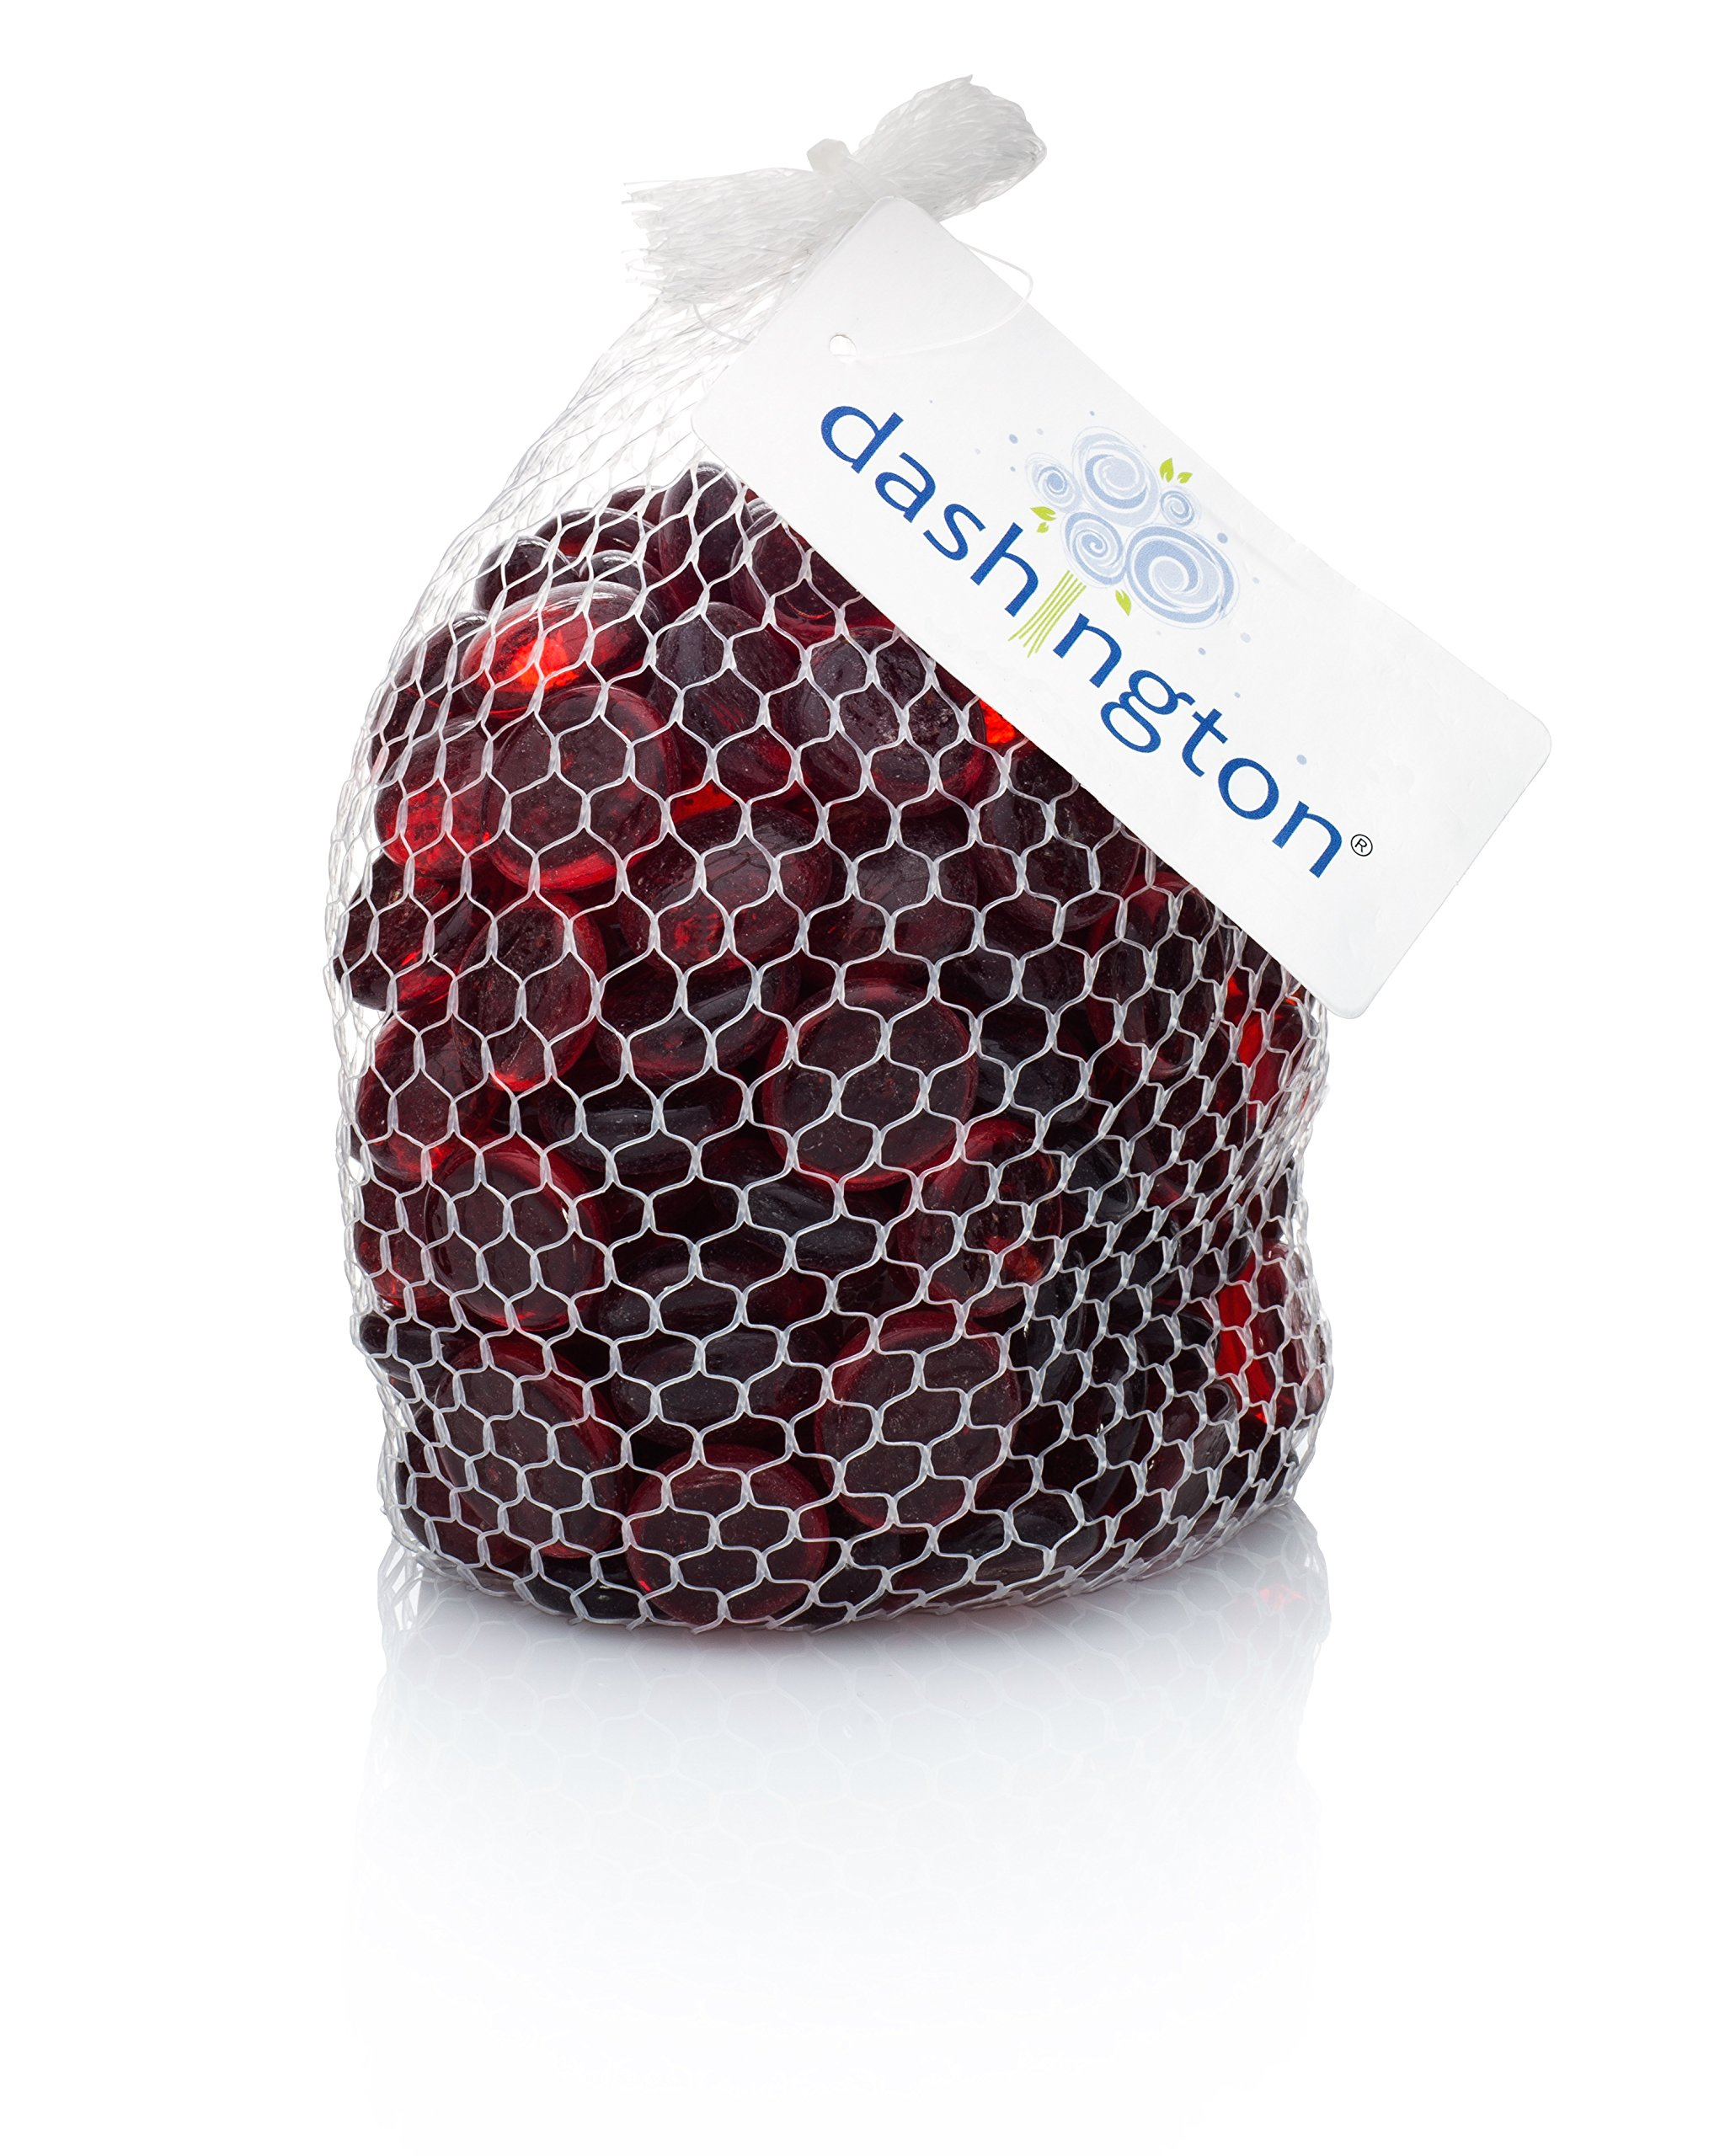 Dashington® Flat Red Marbles, Pebbles (2.5 Pound Bag) for Vase Filler, Table Scatter, Aquarium Decor, Approximately 250-300 Marbles